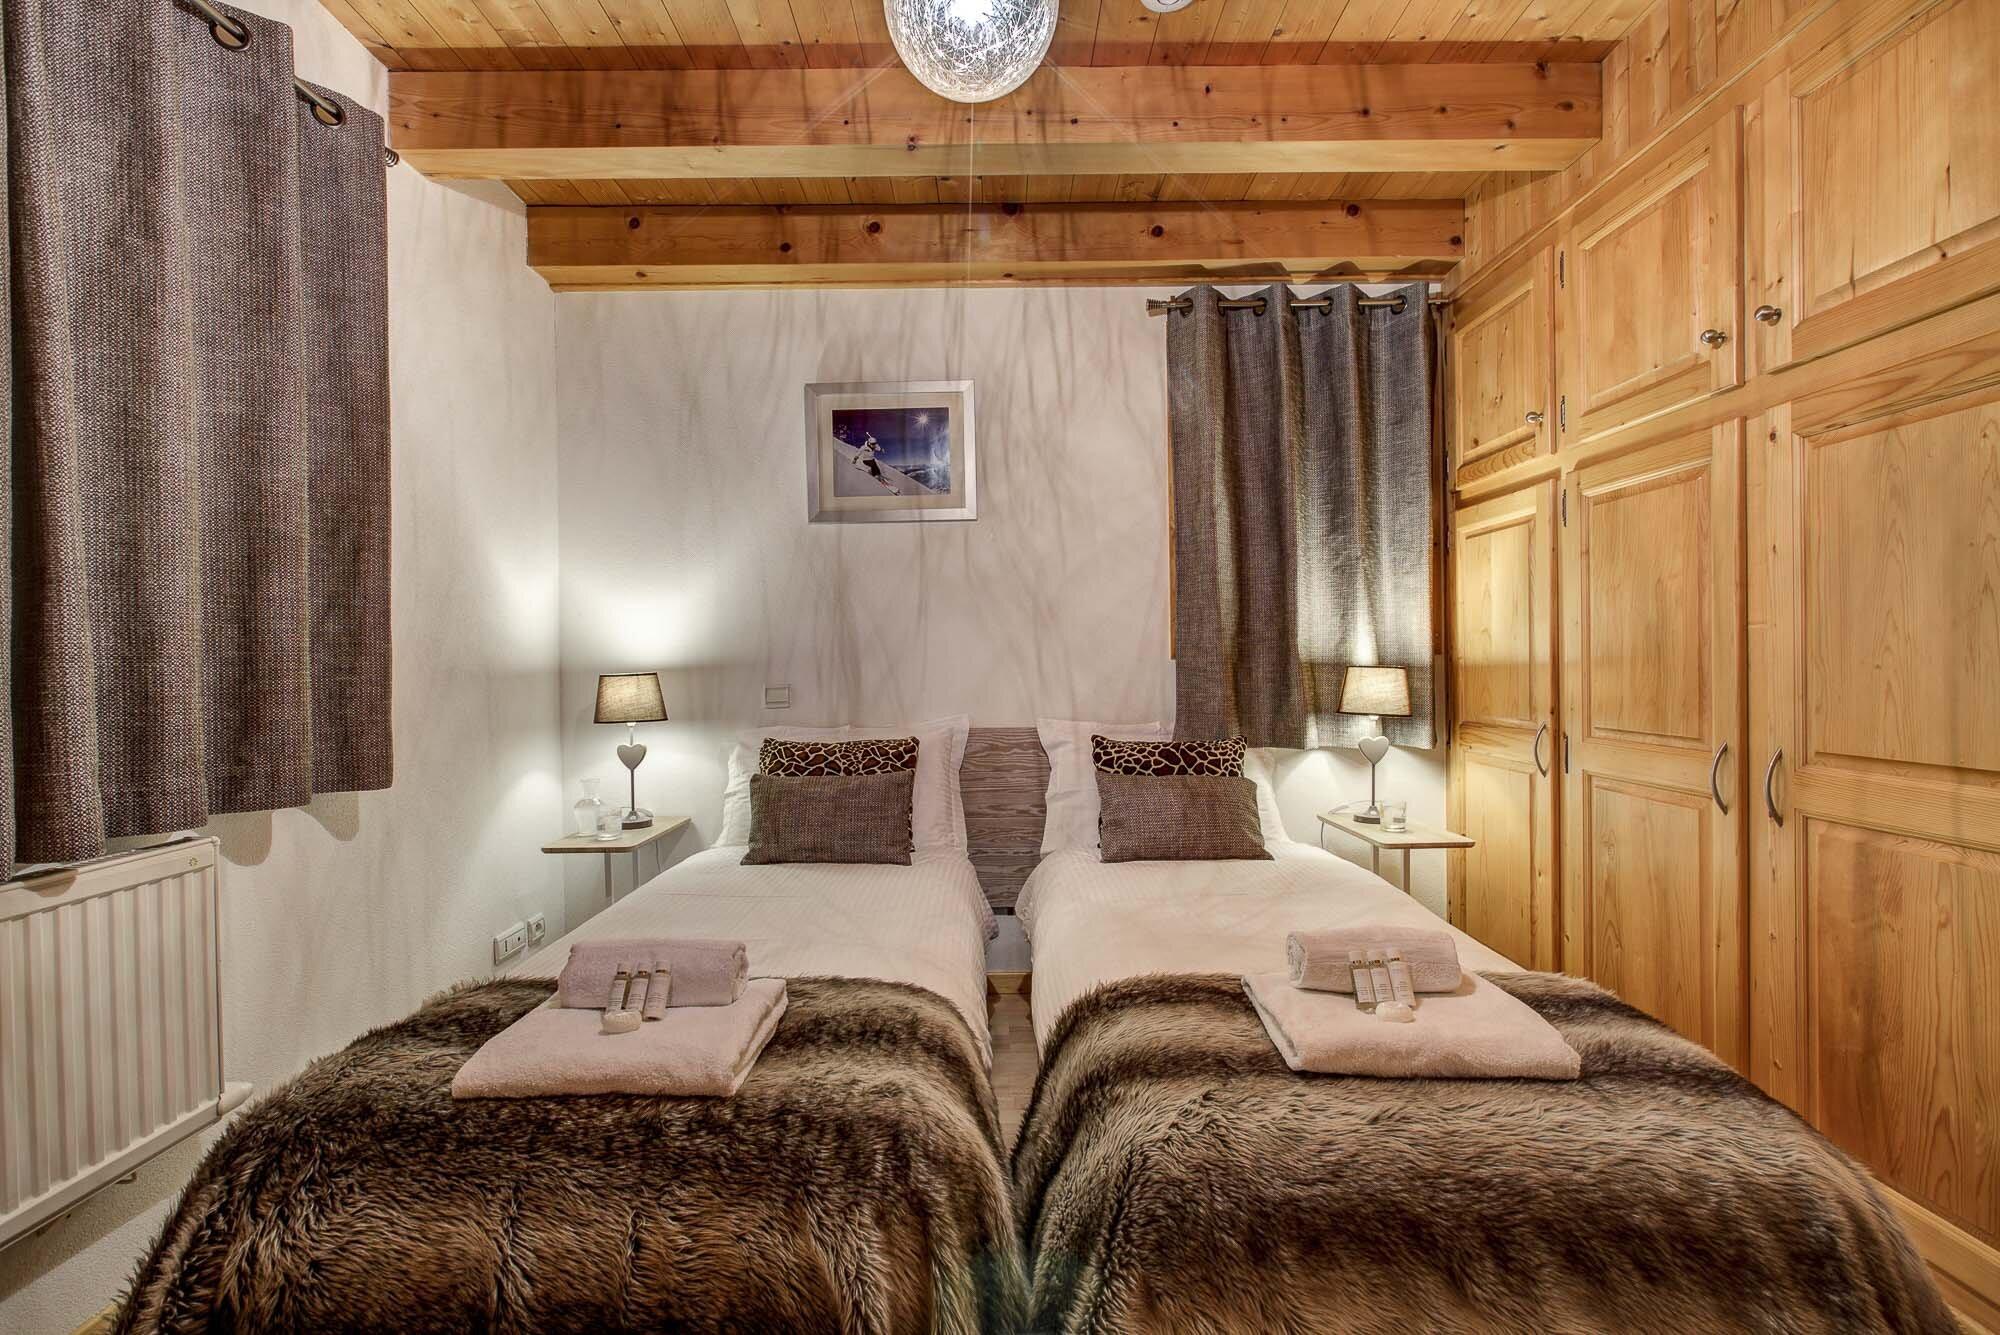 tg-ski-chalet-le-roc-soleil-morzine-014.jpg